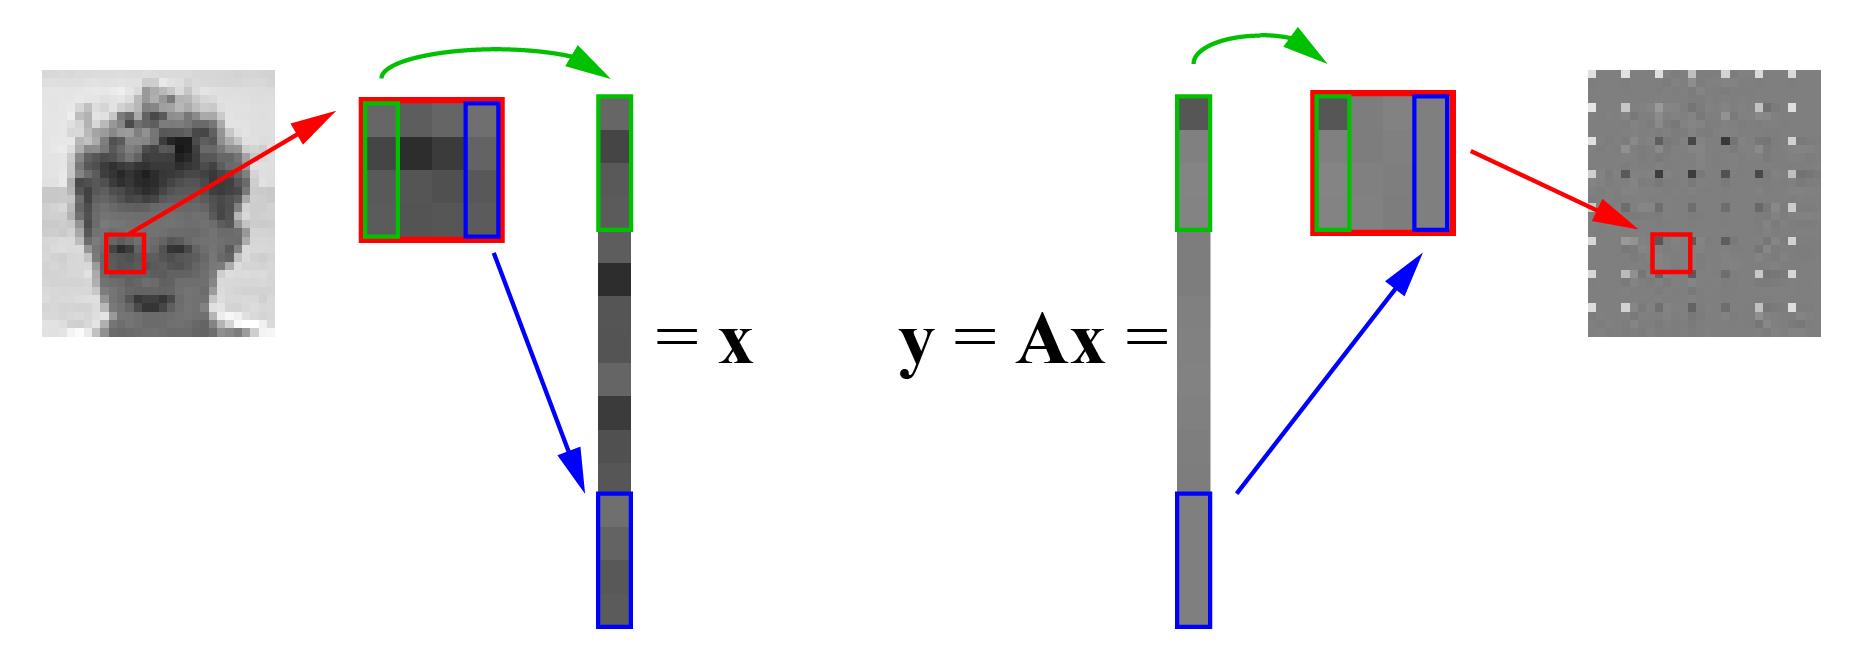 Chapter 9: Linear Mappings (Immersive Linear Algebra)